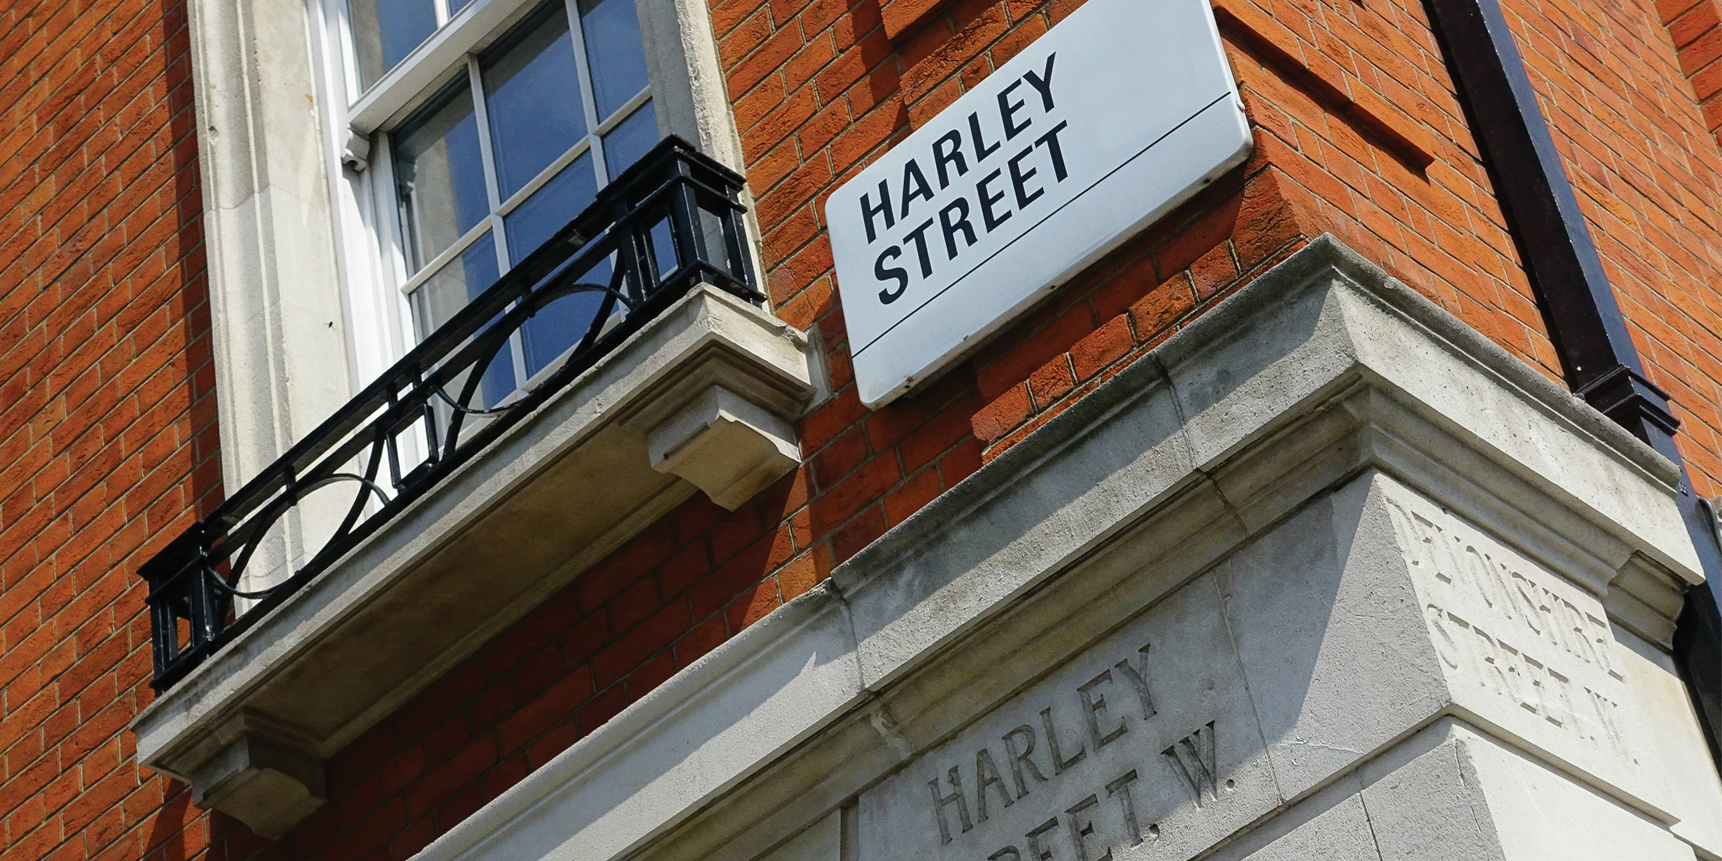 wider harley street.jpg